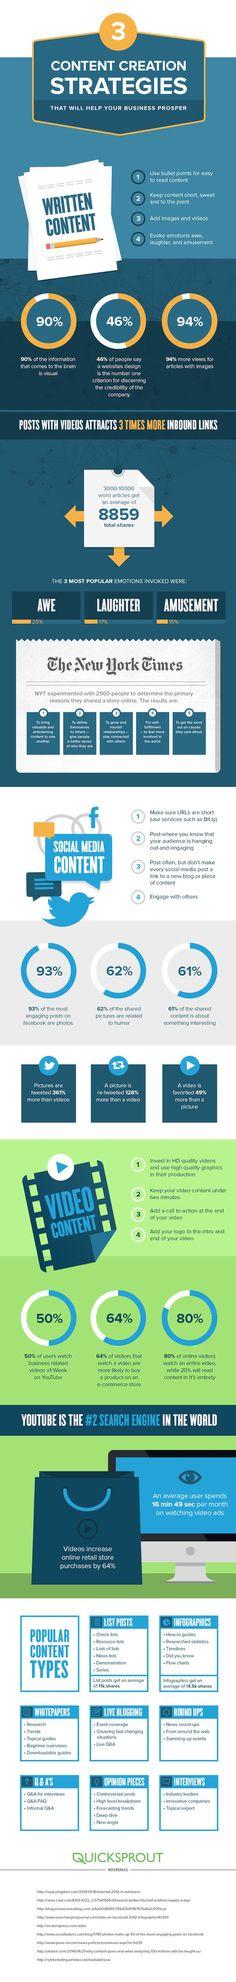 3 Powerful Content Creation Strategies for Social Media Marketersr - #infographic #contentmarketing #socialmedia